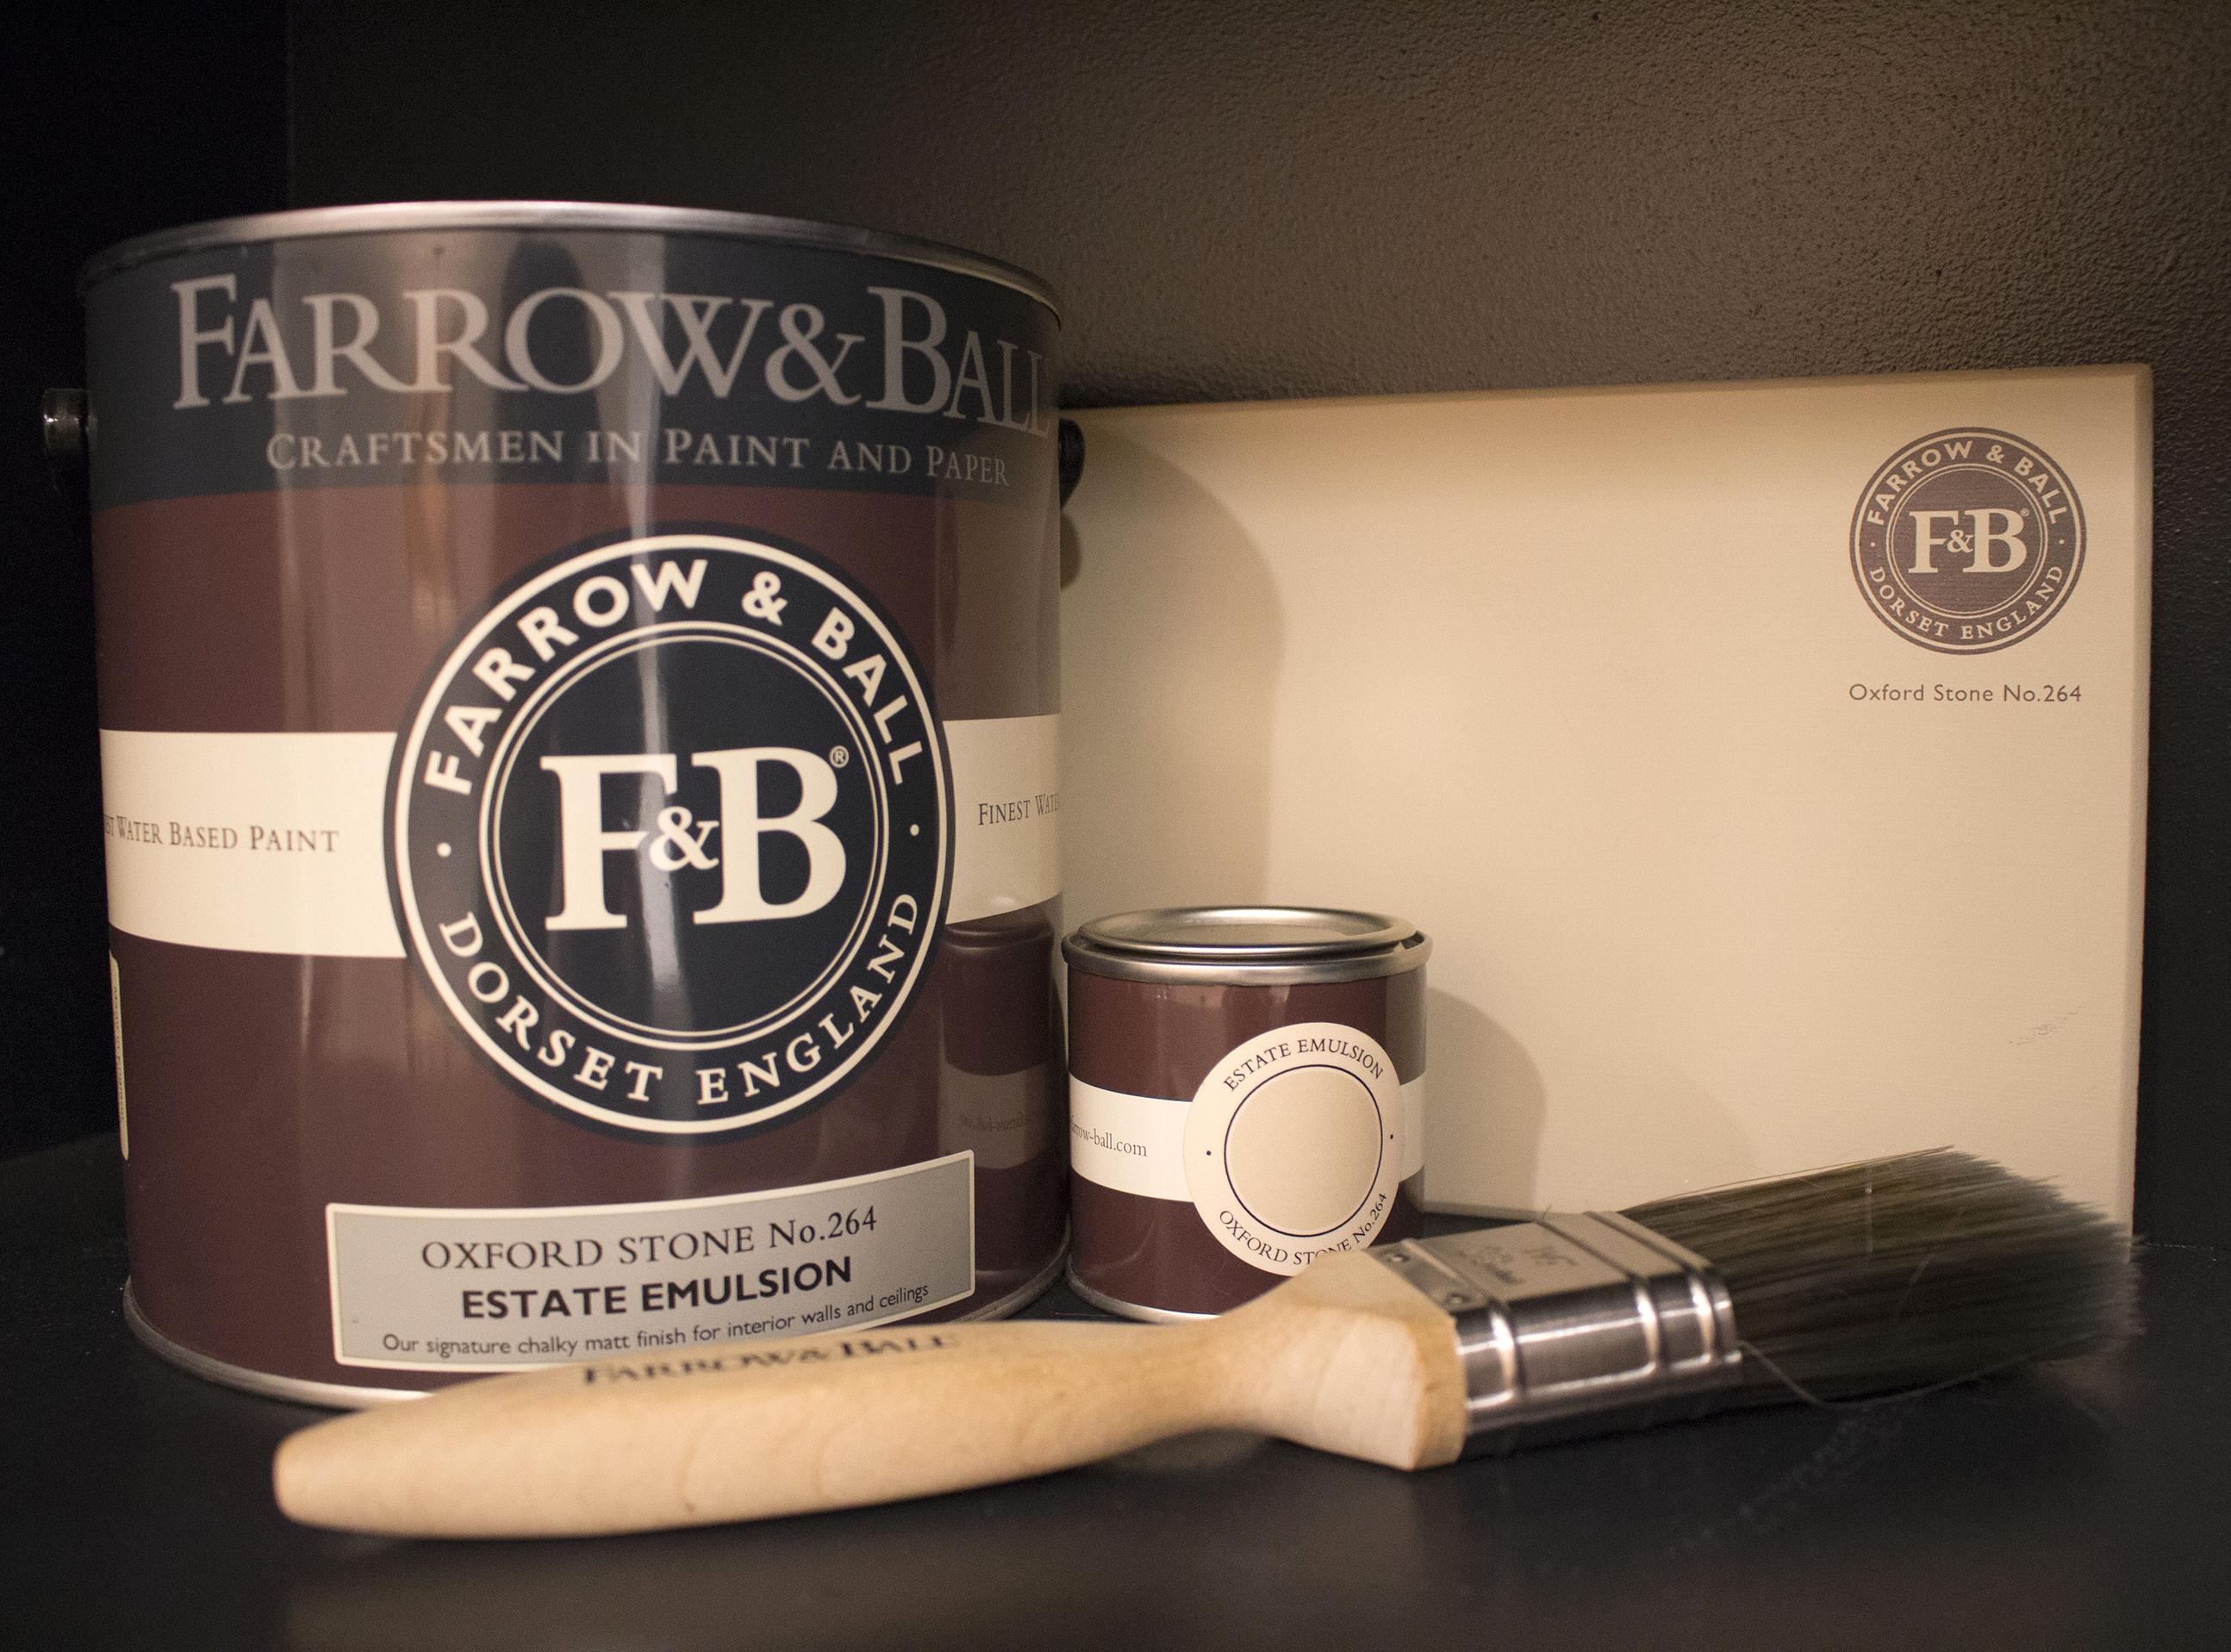 farrow&ball, paint, craft, decoration, home decoration, craftsmen, dorset, paint brush